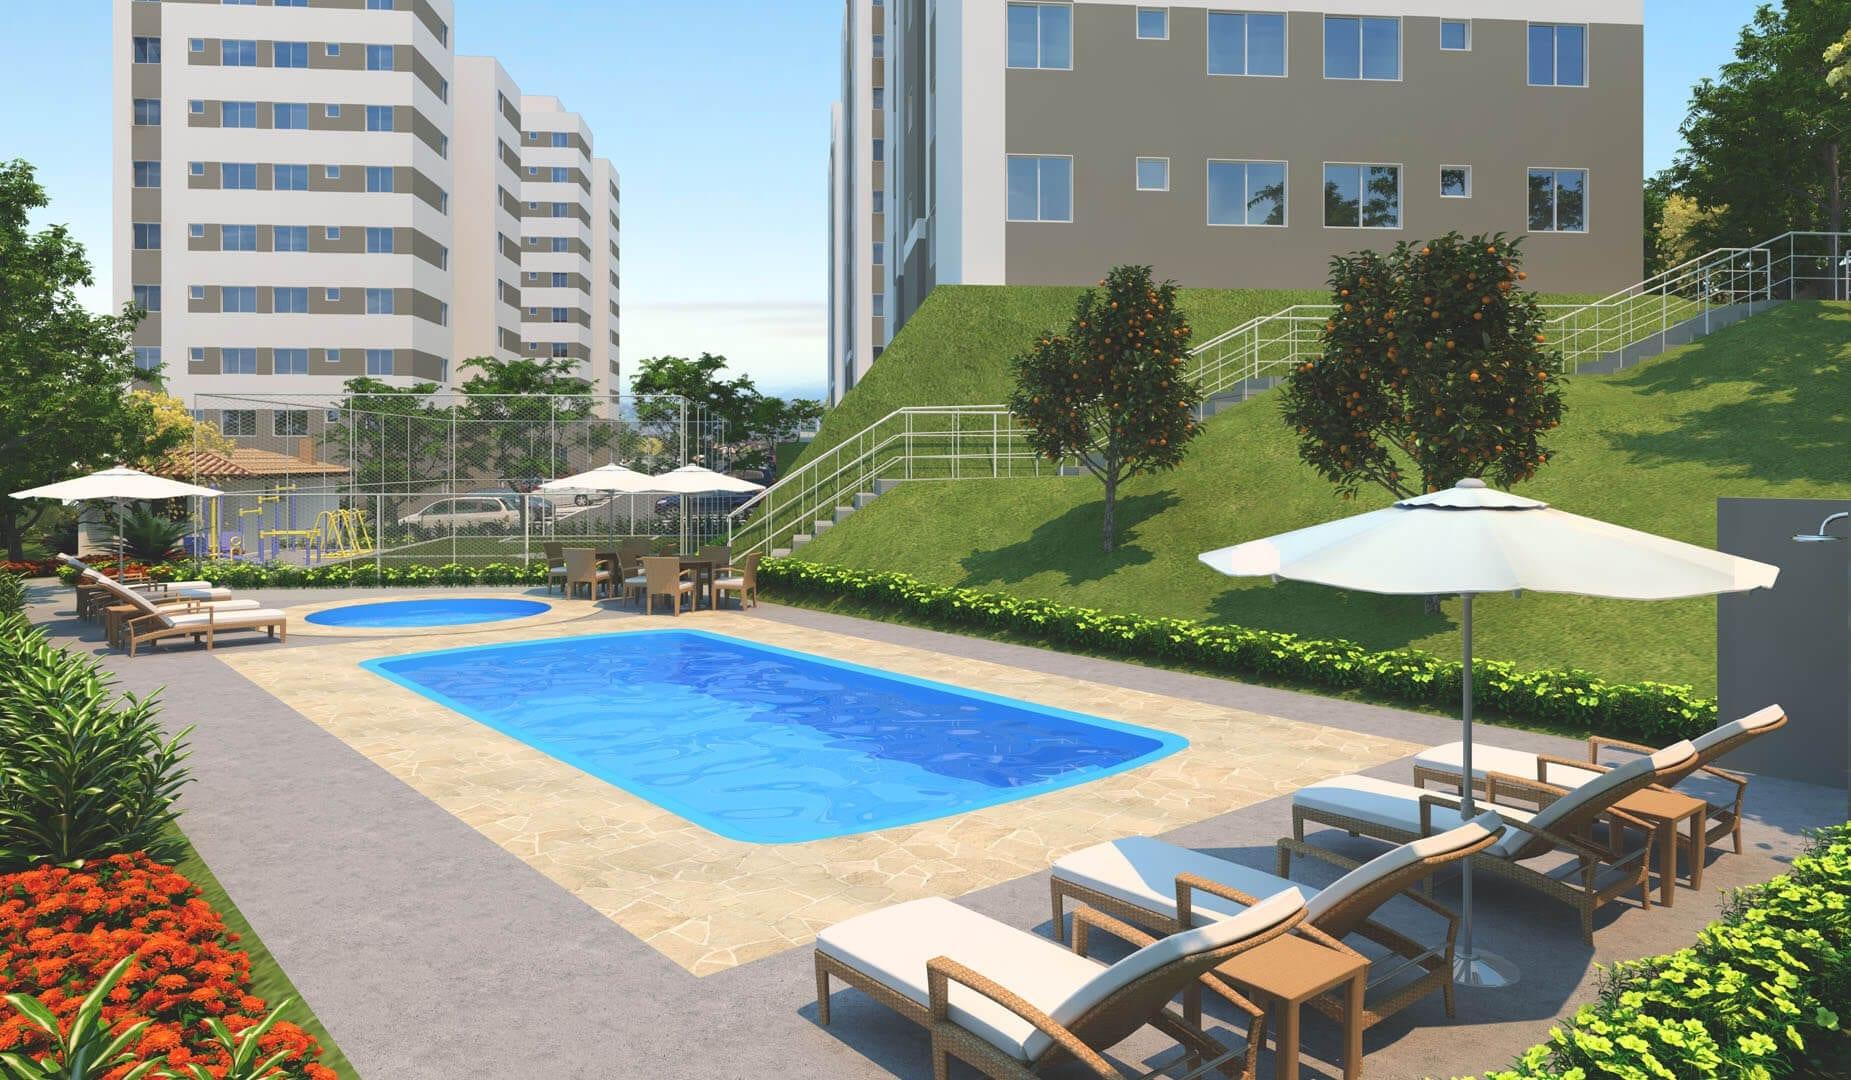 vic-engenharia-master-tower-siena-piscina